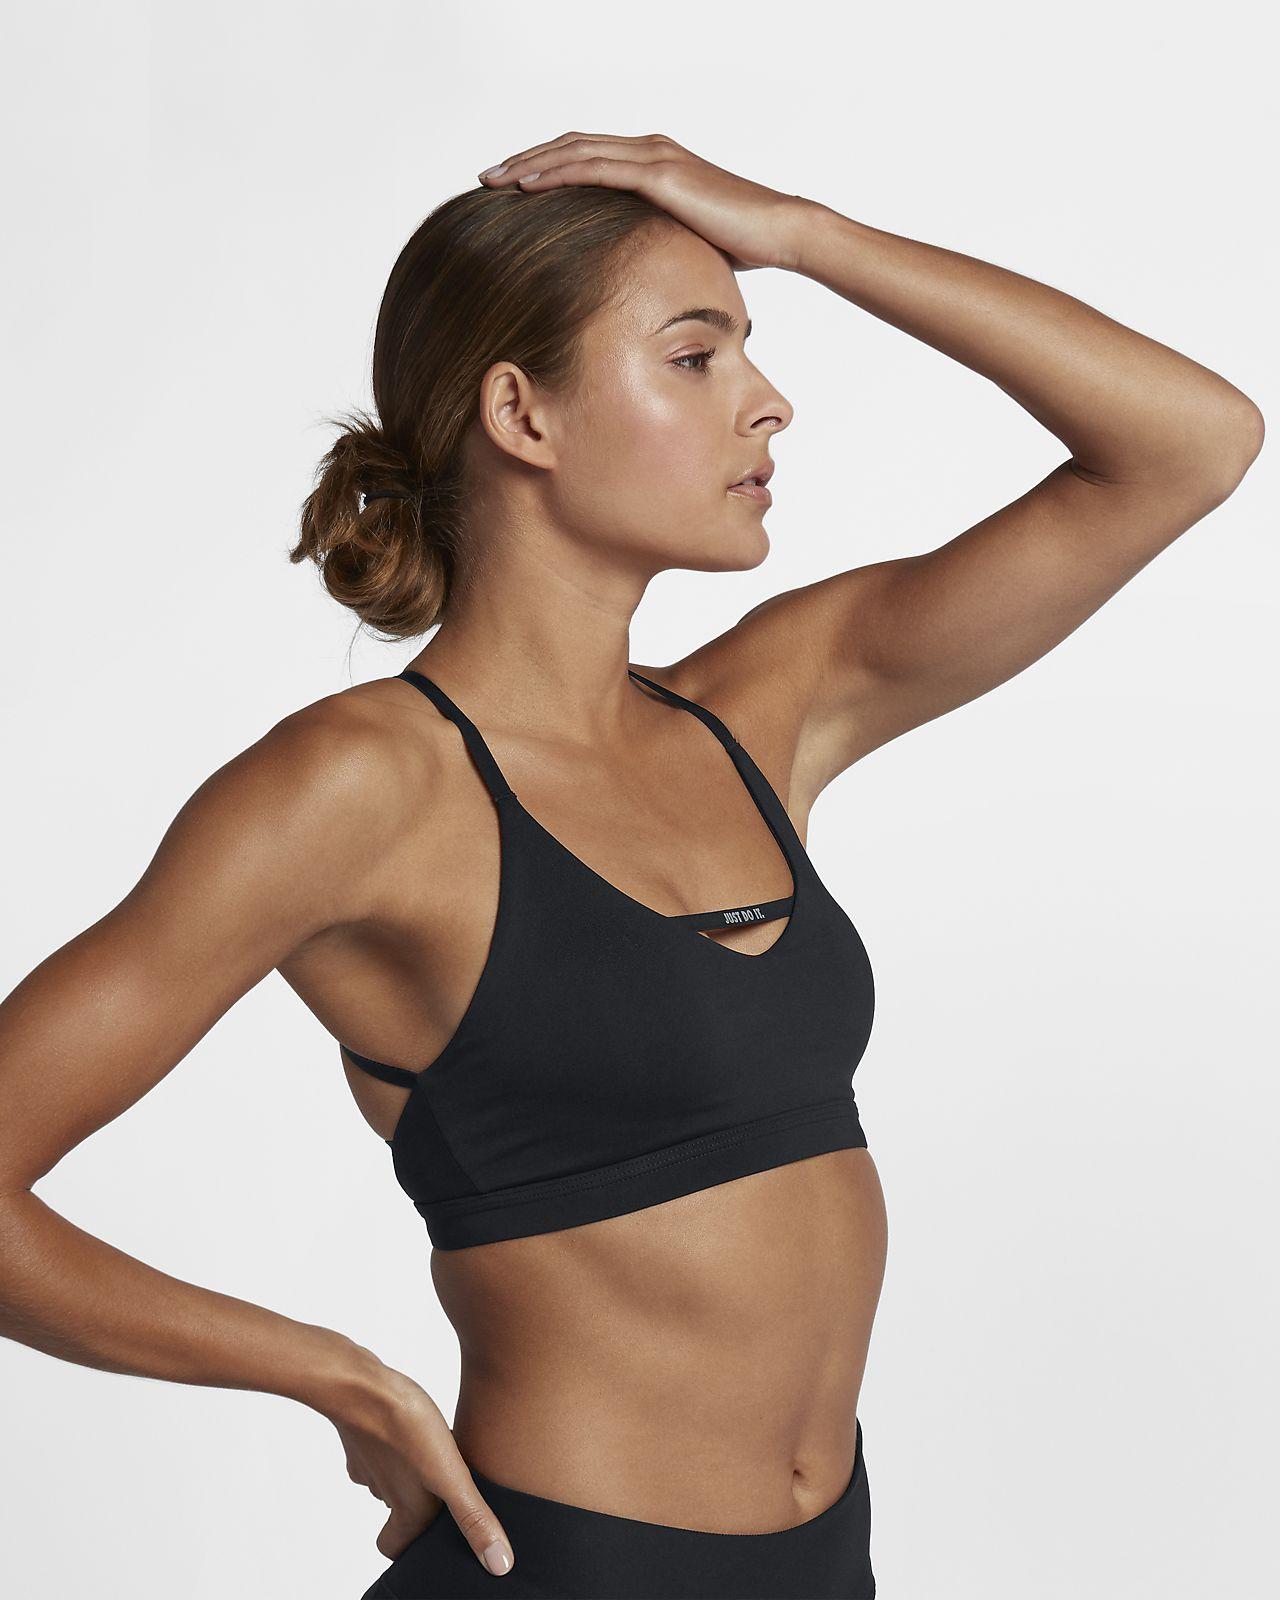 Nike Indy Women's JDI Light Support Sports Bra